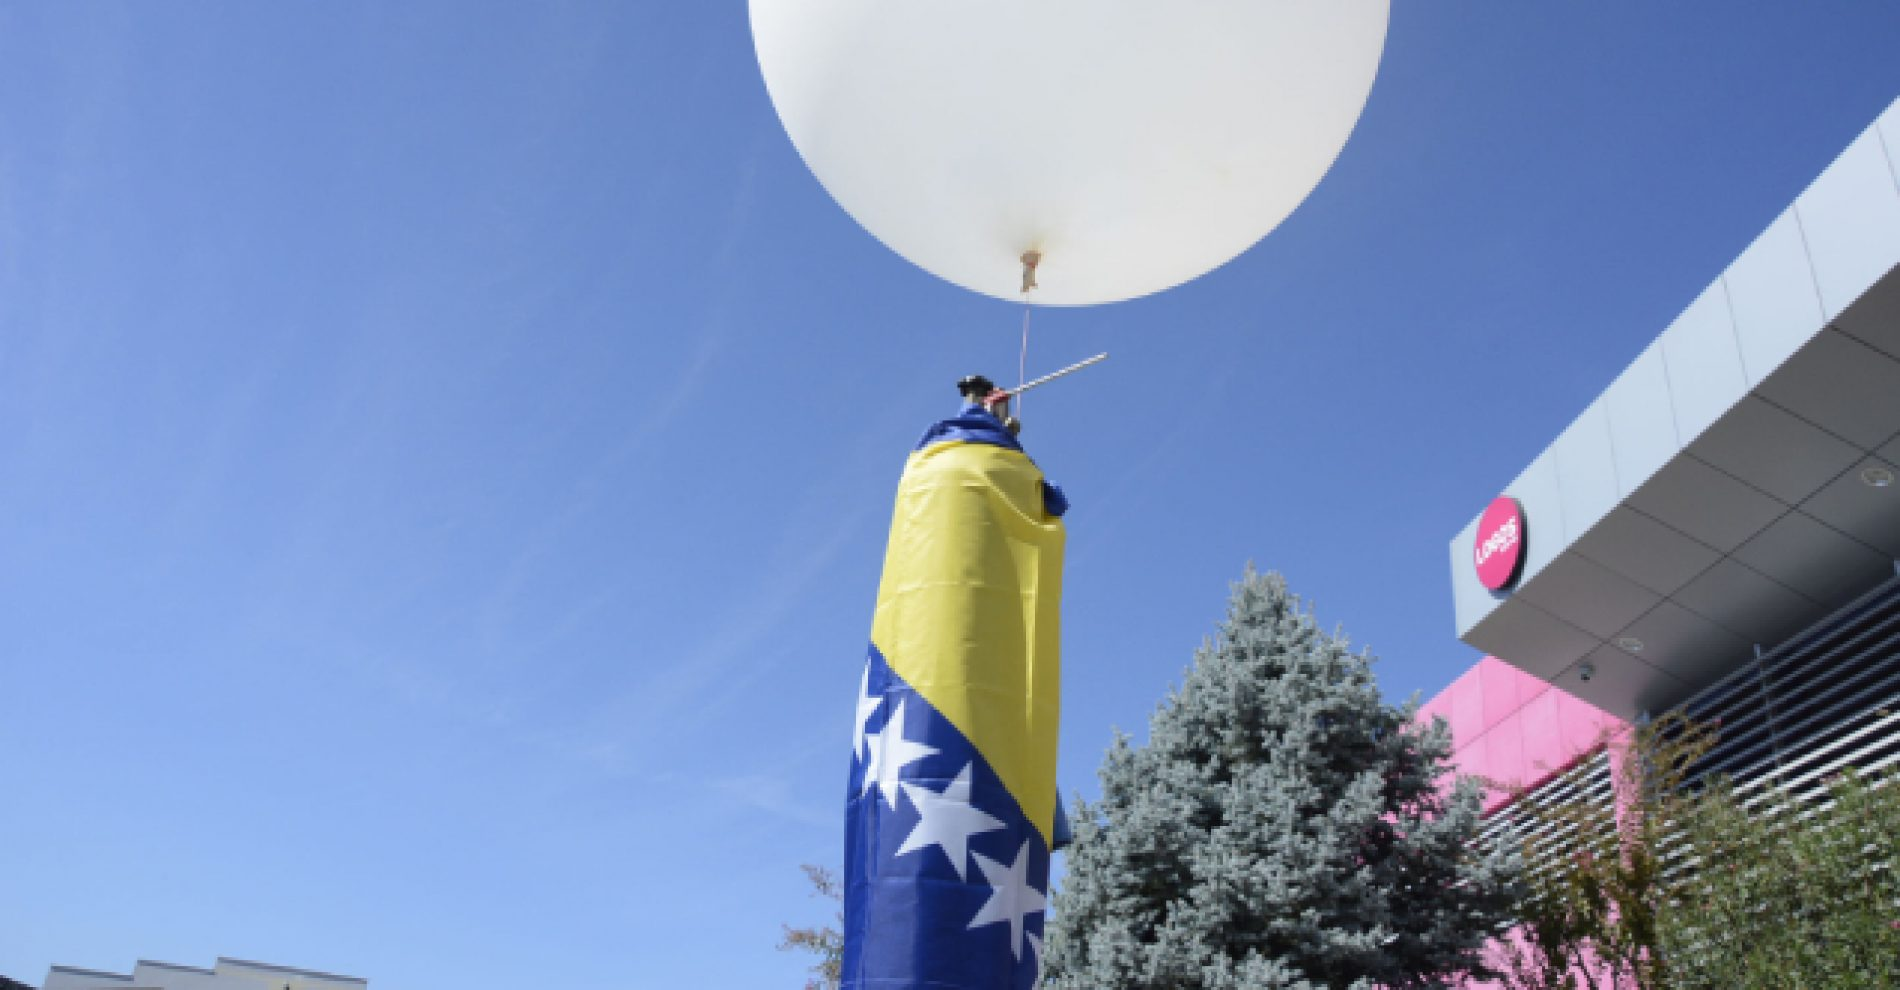 Mladi bosanskohercegovački robotičari lansirali satelit u atmosferu